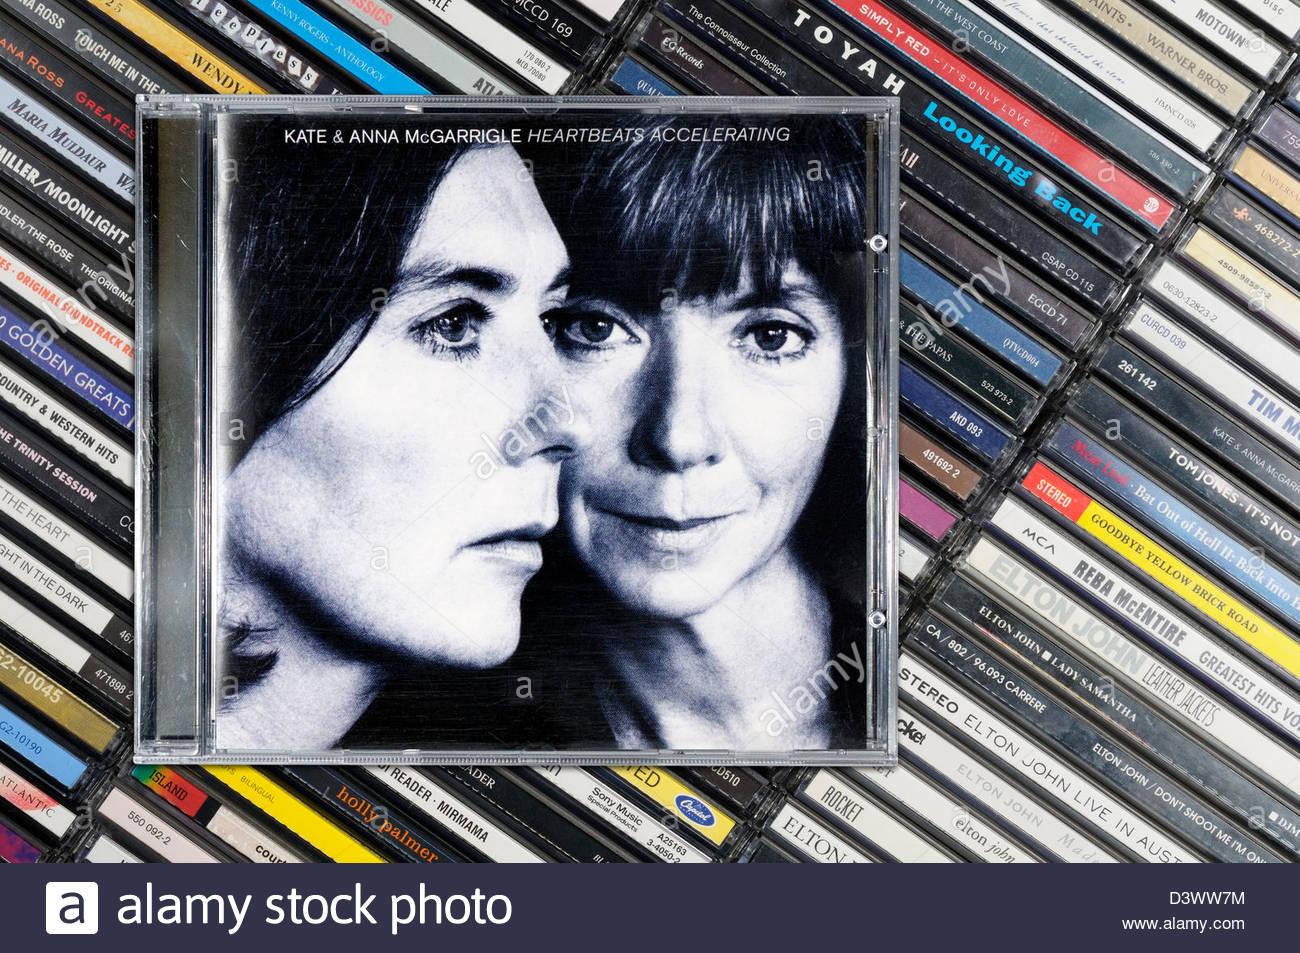 Kate e Anna McGarrigle album heartbeat accelerando, impilati CD musicale casi, Inghilterra Immagini Stock